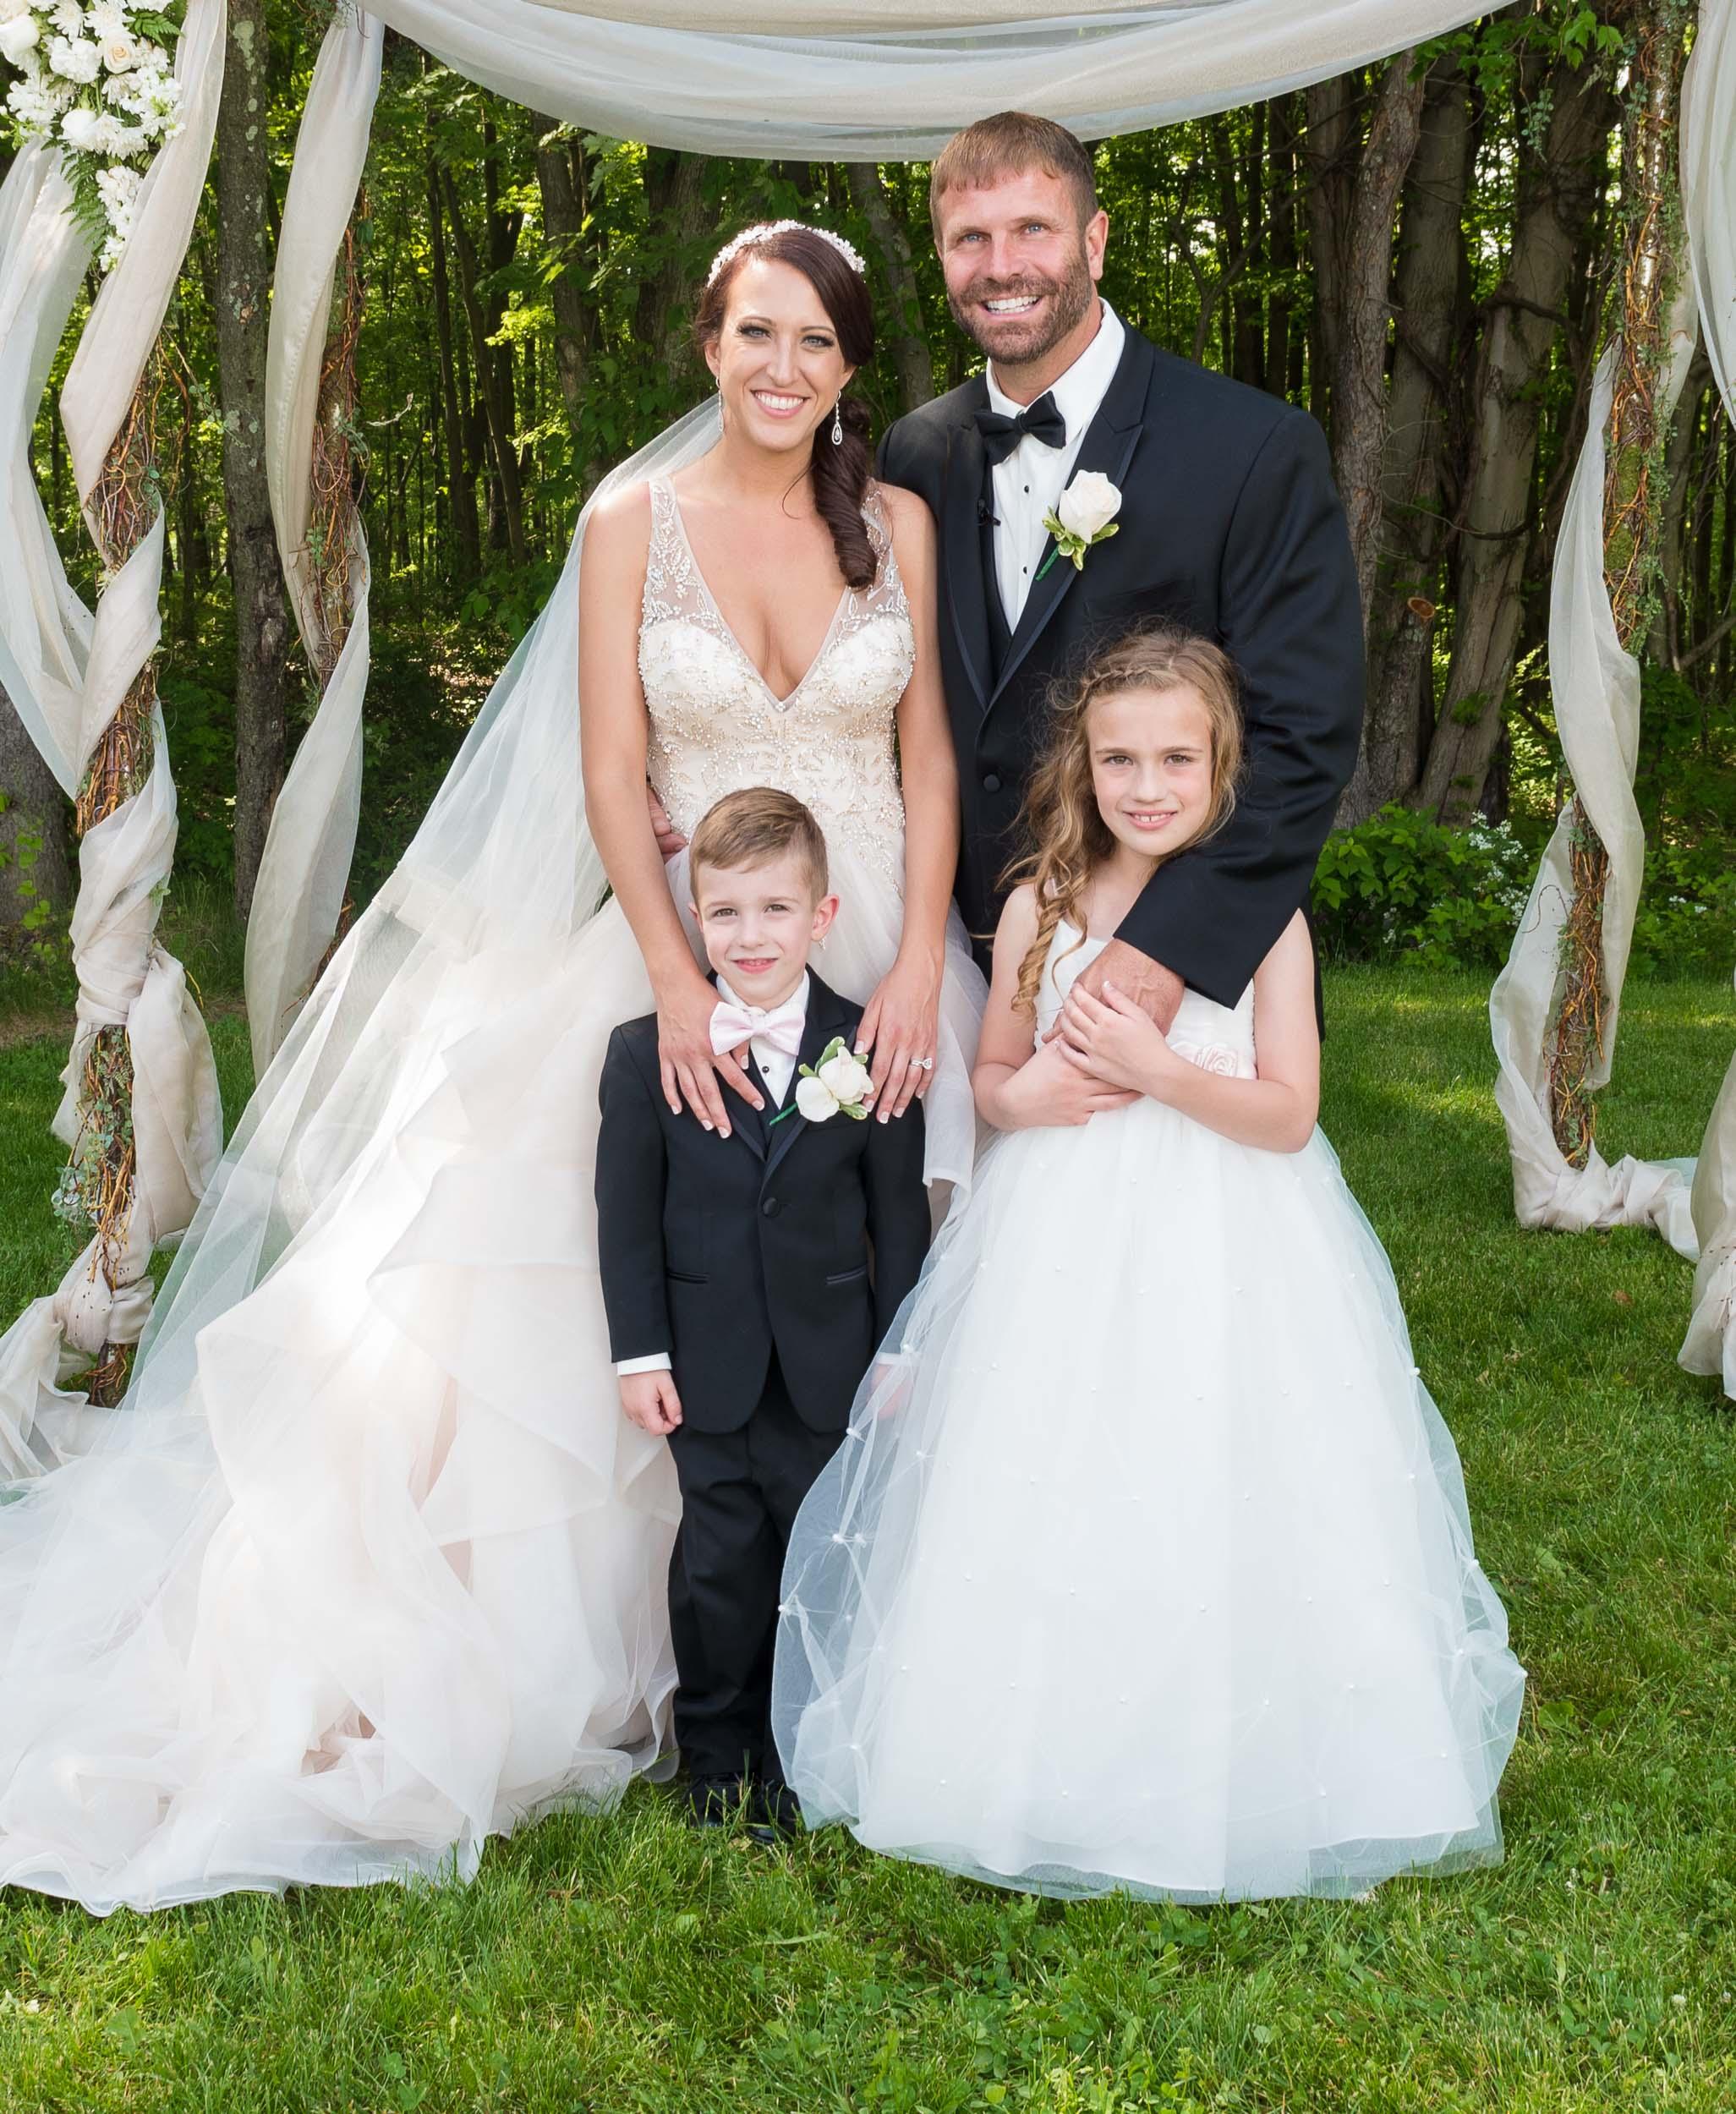 Bride-groom-son-daughter-portrait-2.jpg